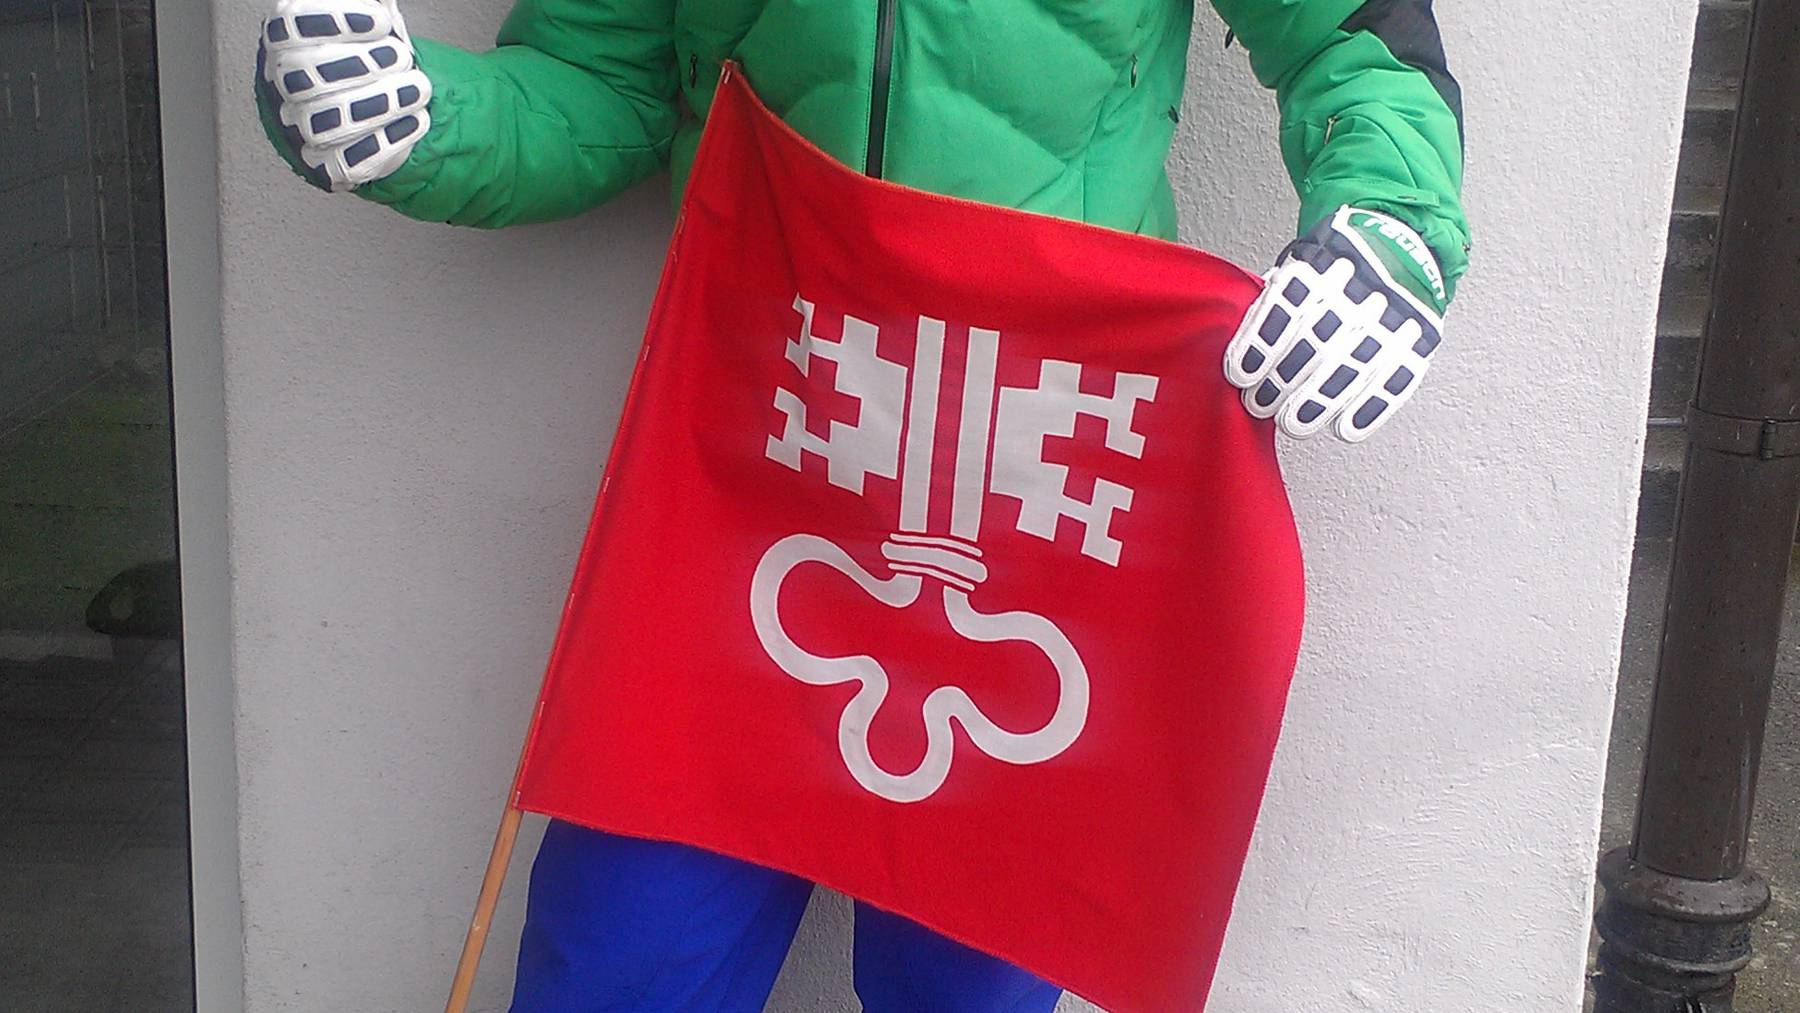 Swiss Ski übt Gnade bei WM-Selektion